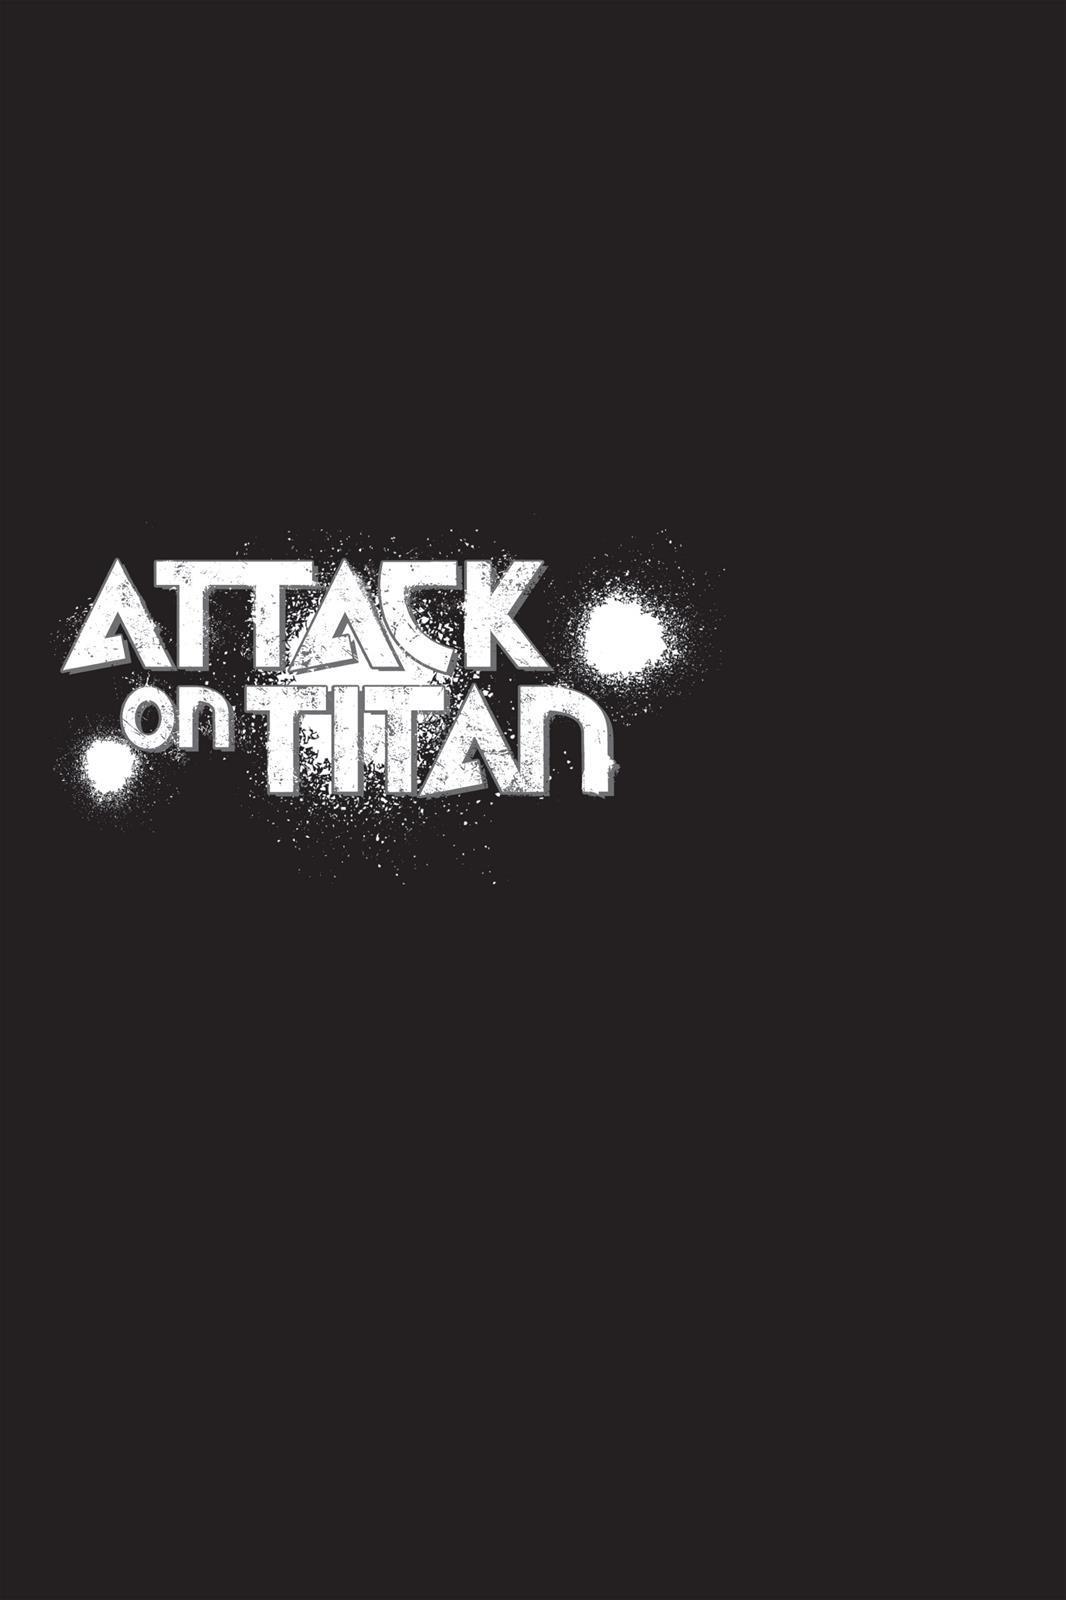 Attack On Titan, Episode 11 image 041